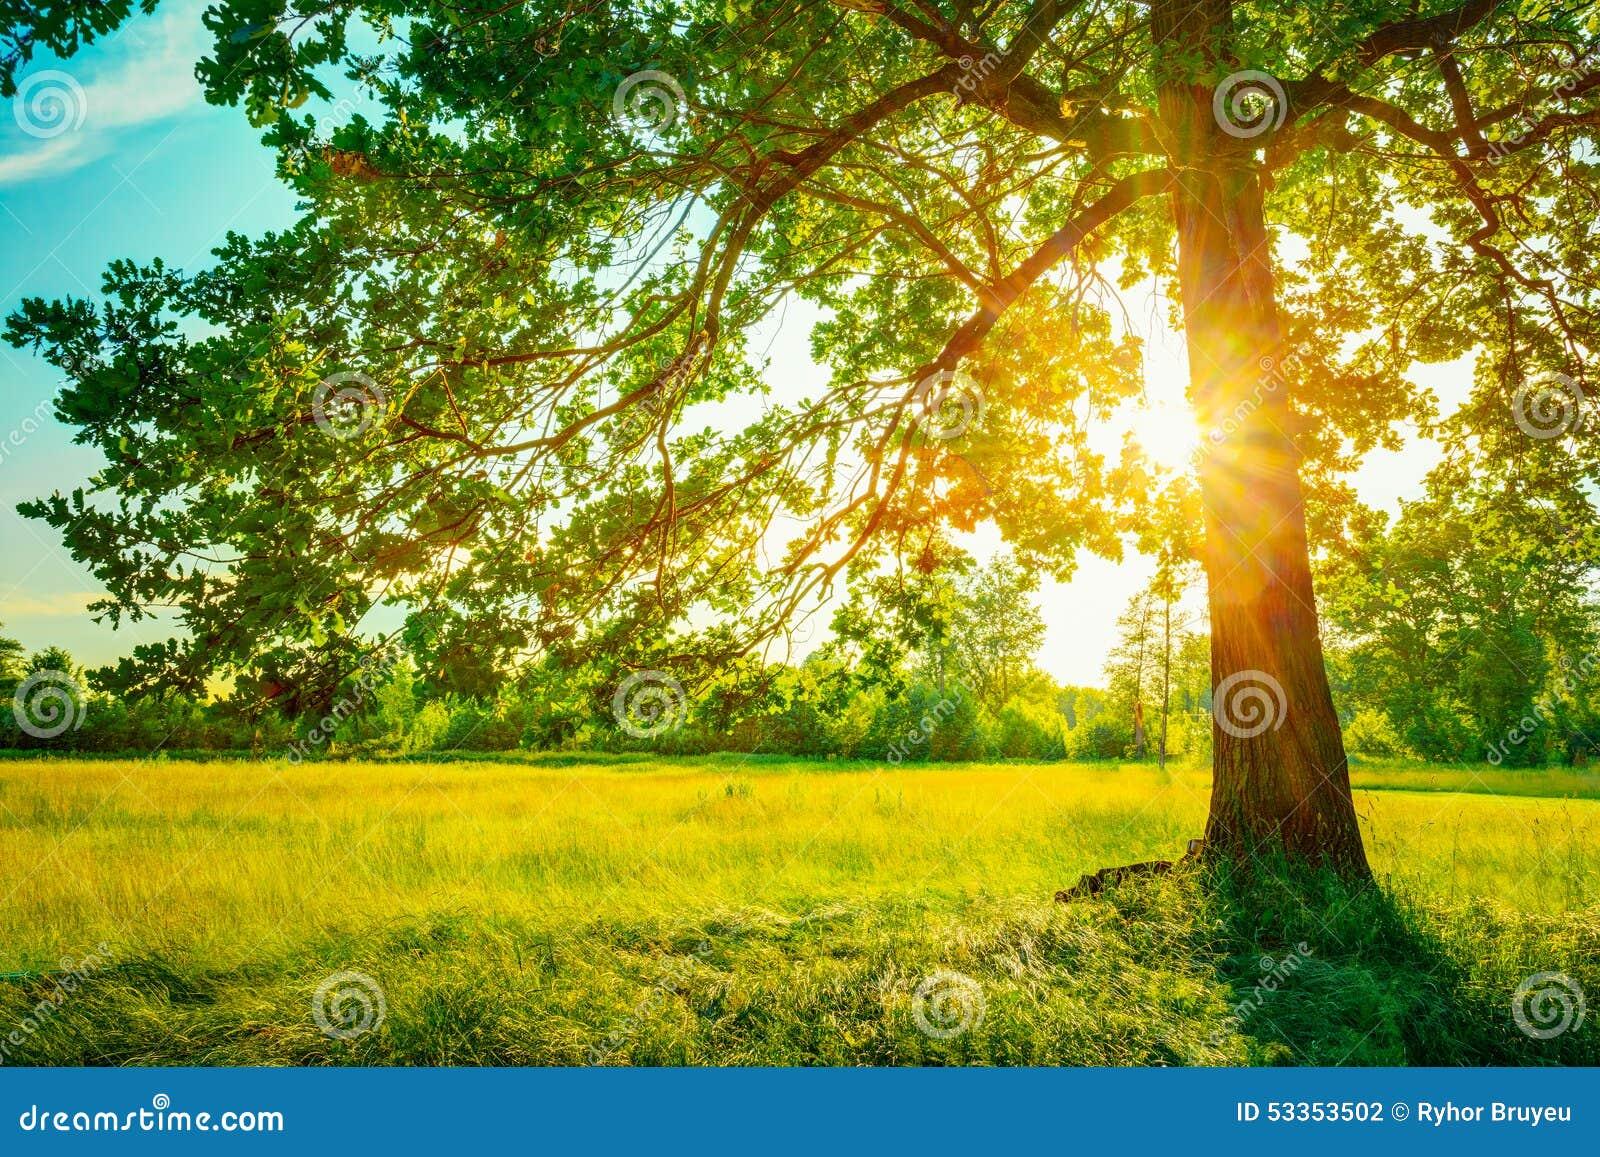 Verão Sunny Forest Trees And Green Grass nave